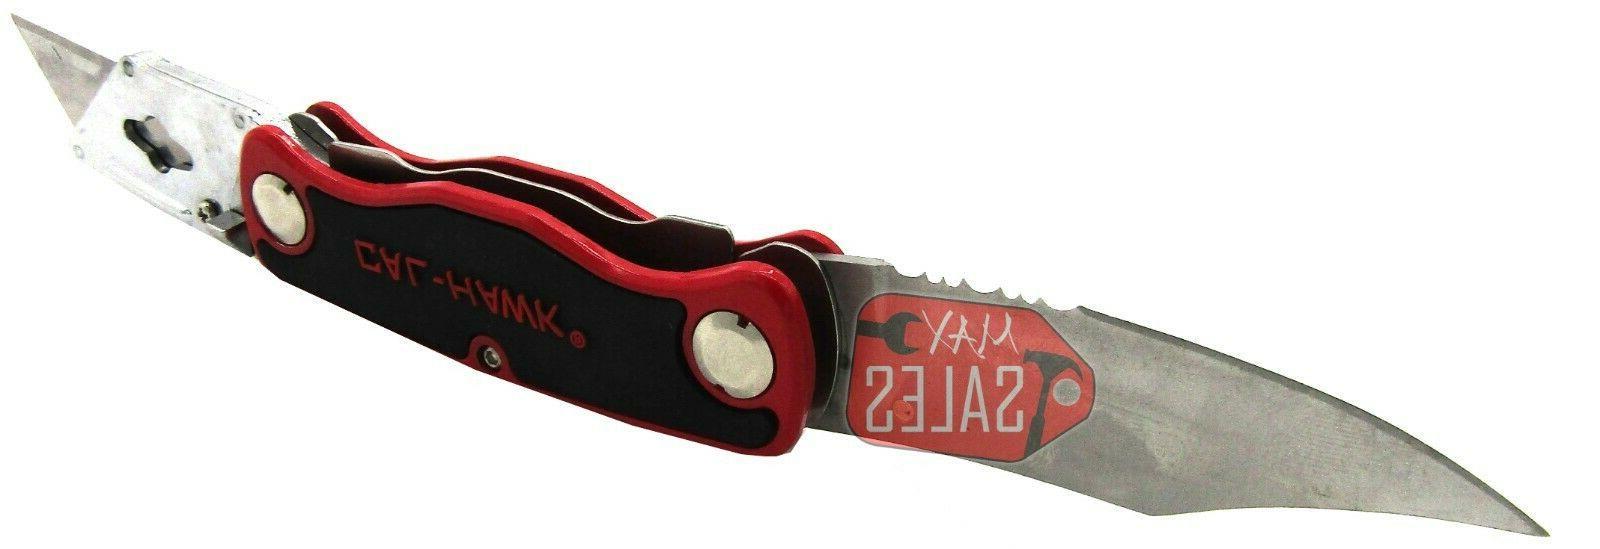 New Dual Blade Change Folding Lock Back Utility Knife